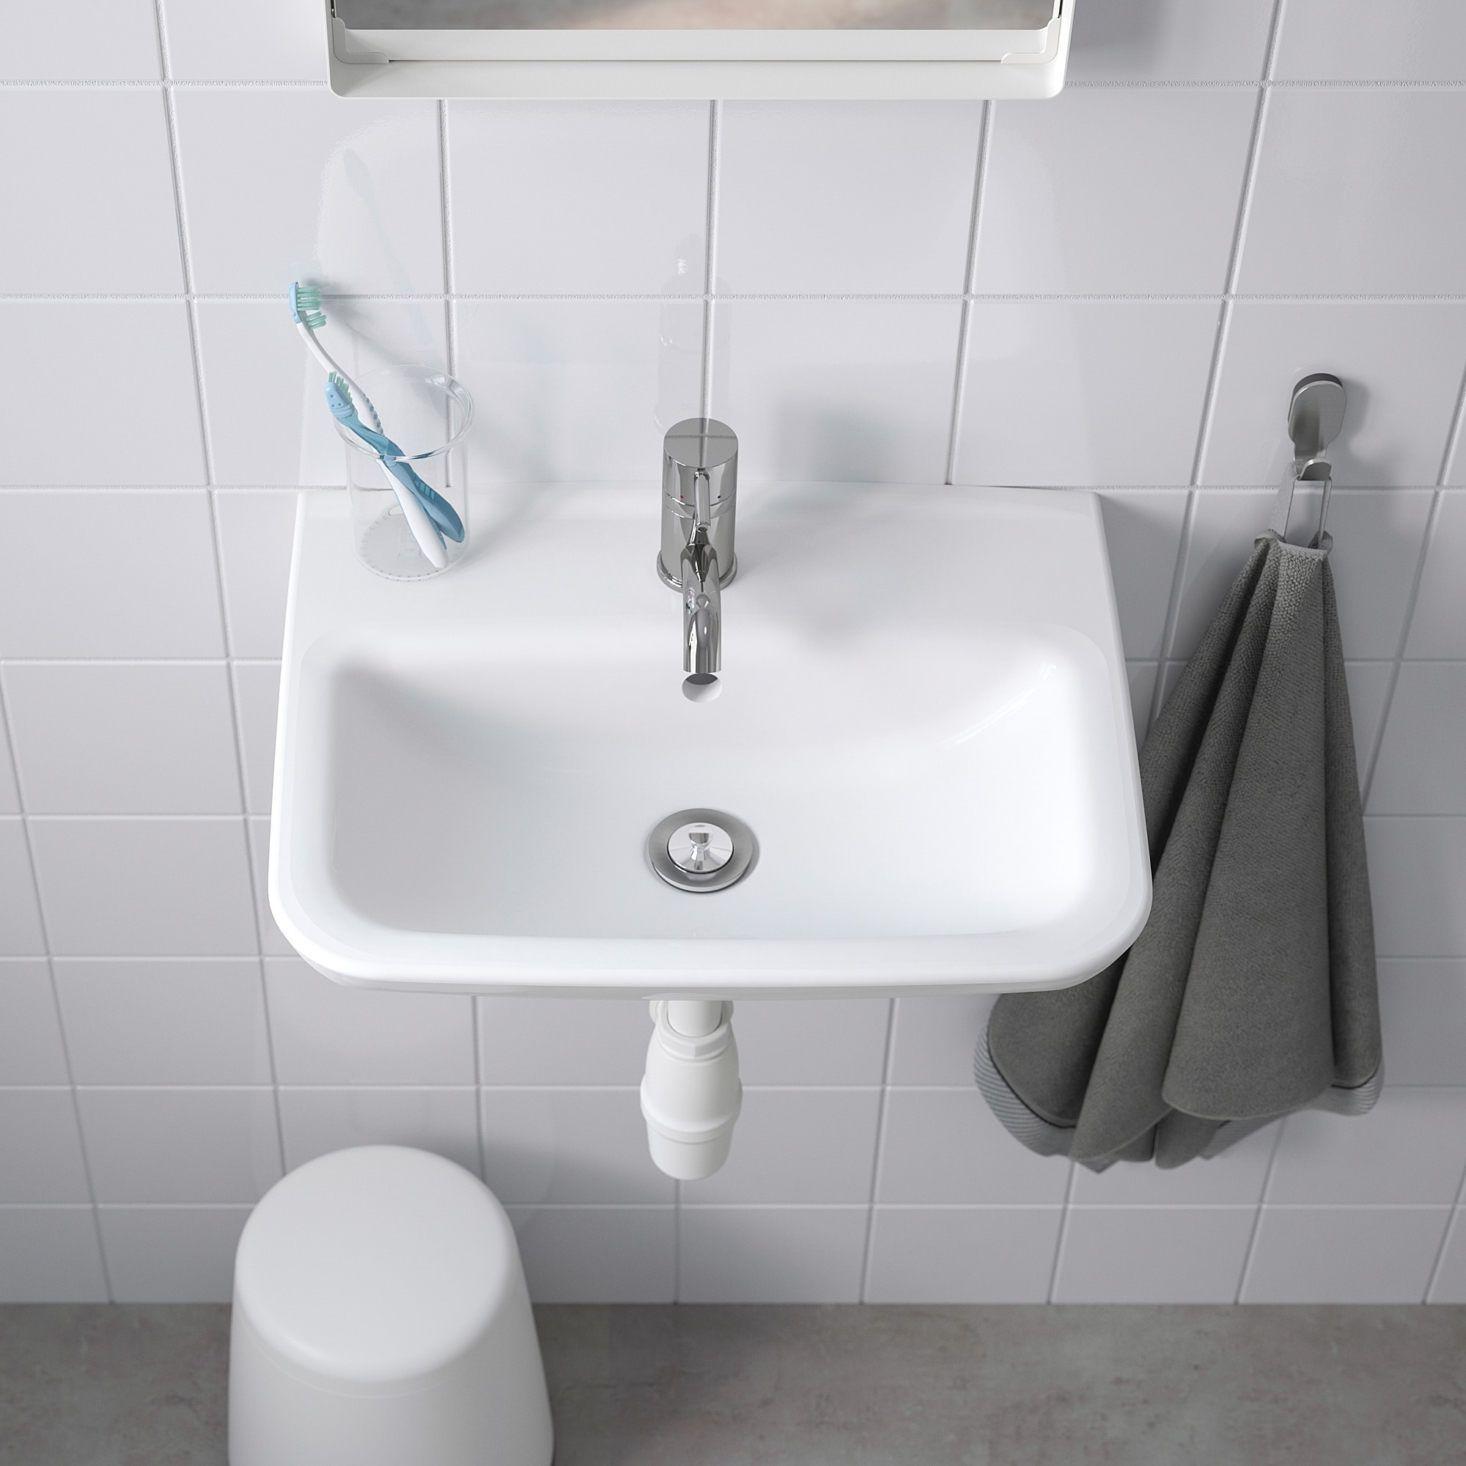 10 Easy Pieces Wall Mounted Guest Bath Sinks Remodelista Sink Bathroom Sink Design Sink Design [ 1466 x 1466 Pixel ]